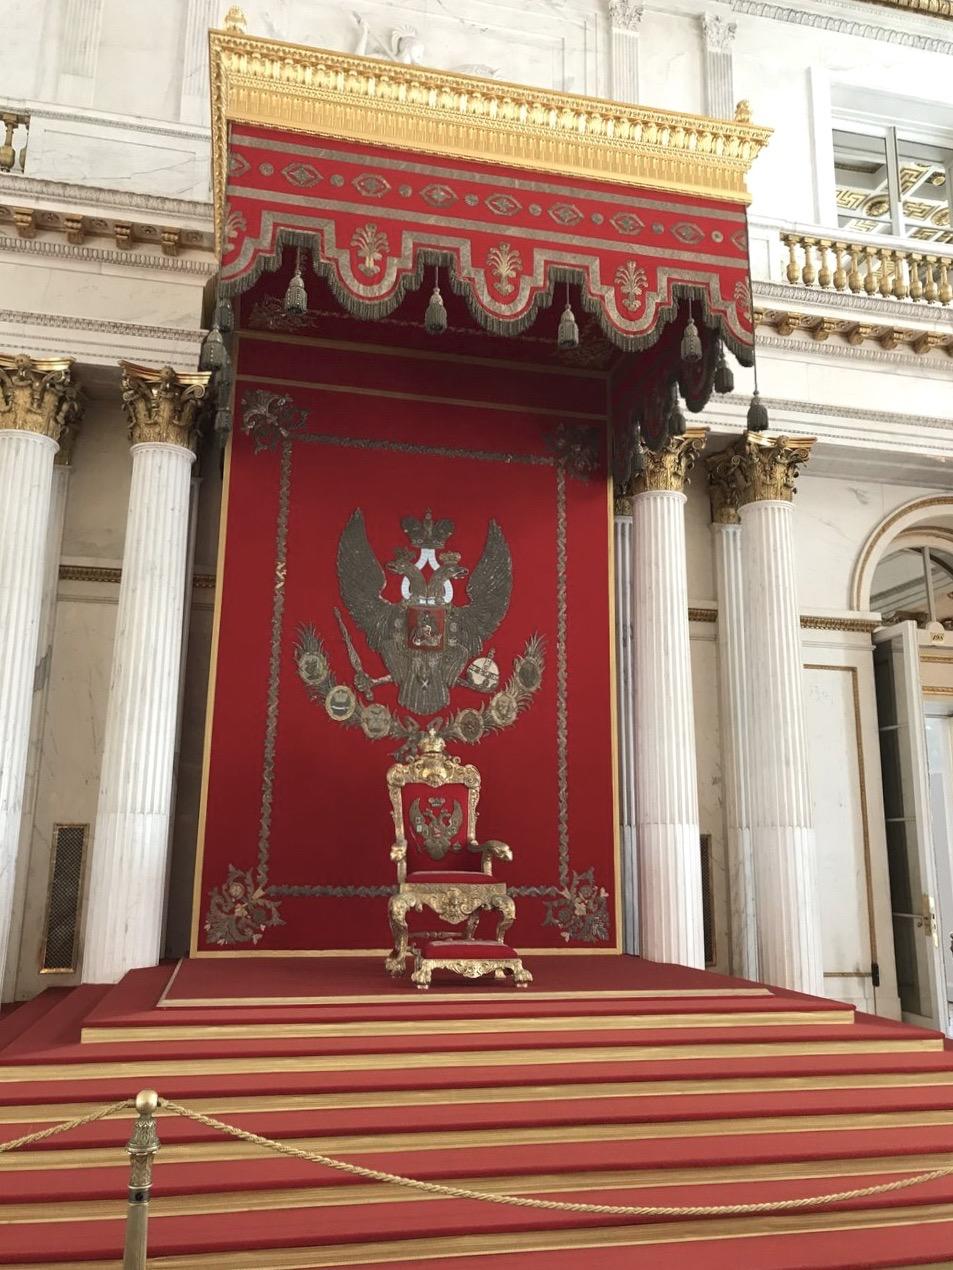 Teri_St.Petersburg_Hermitage_day2_spiritedtable_photo45.jpg